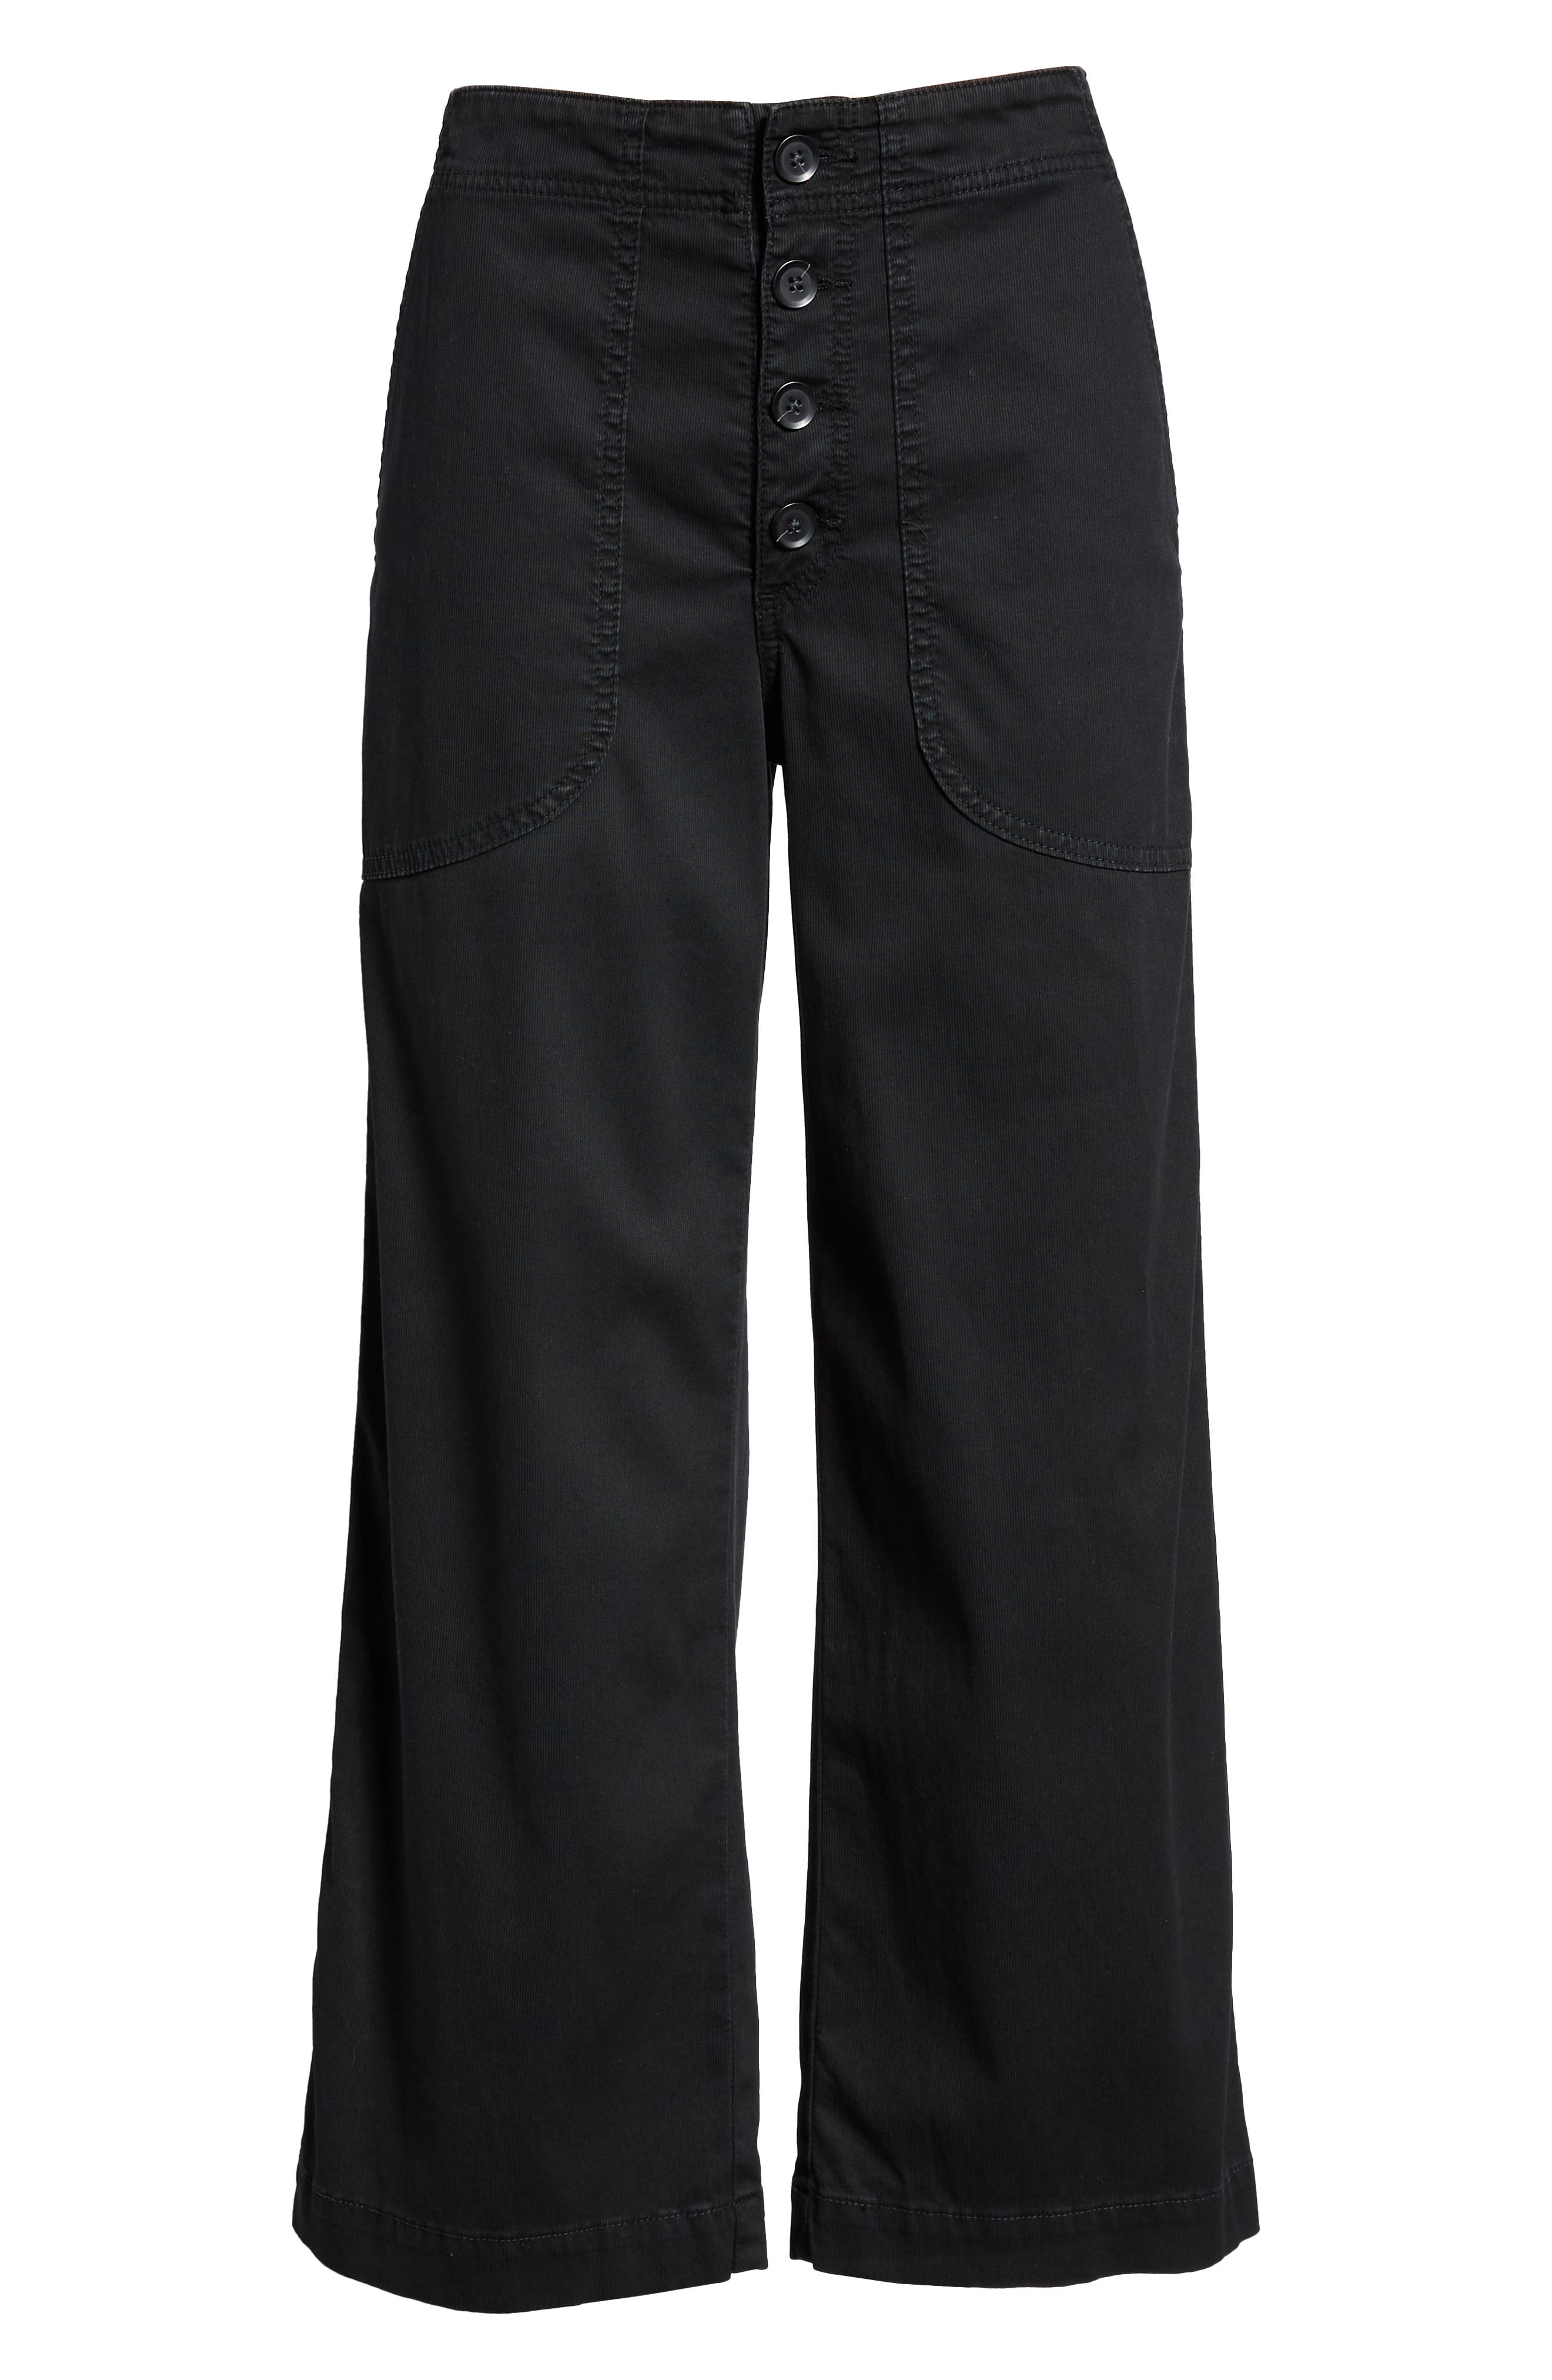 Etta High Waist Crop Wide Leg Jeans,                             Alternate thumbnail 7, color,                             SULFUR SUPER BLACK